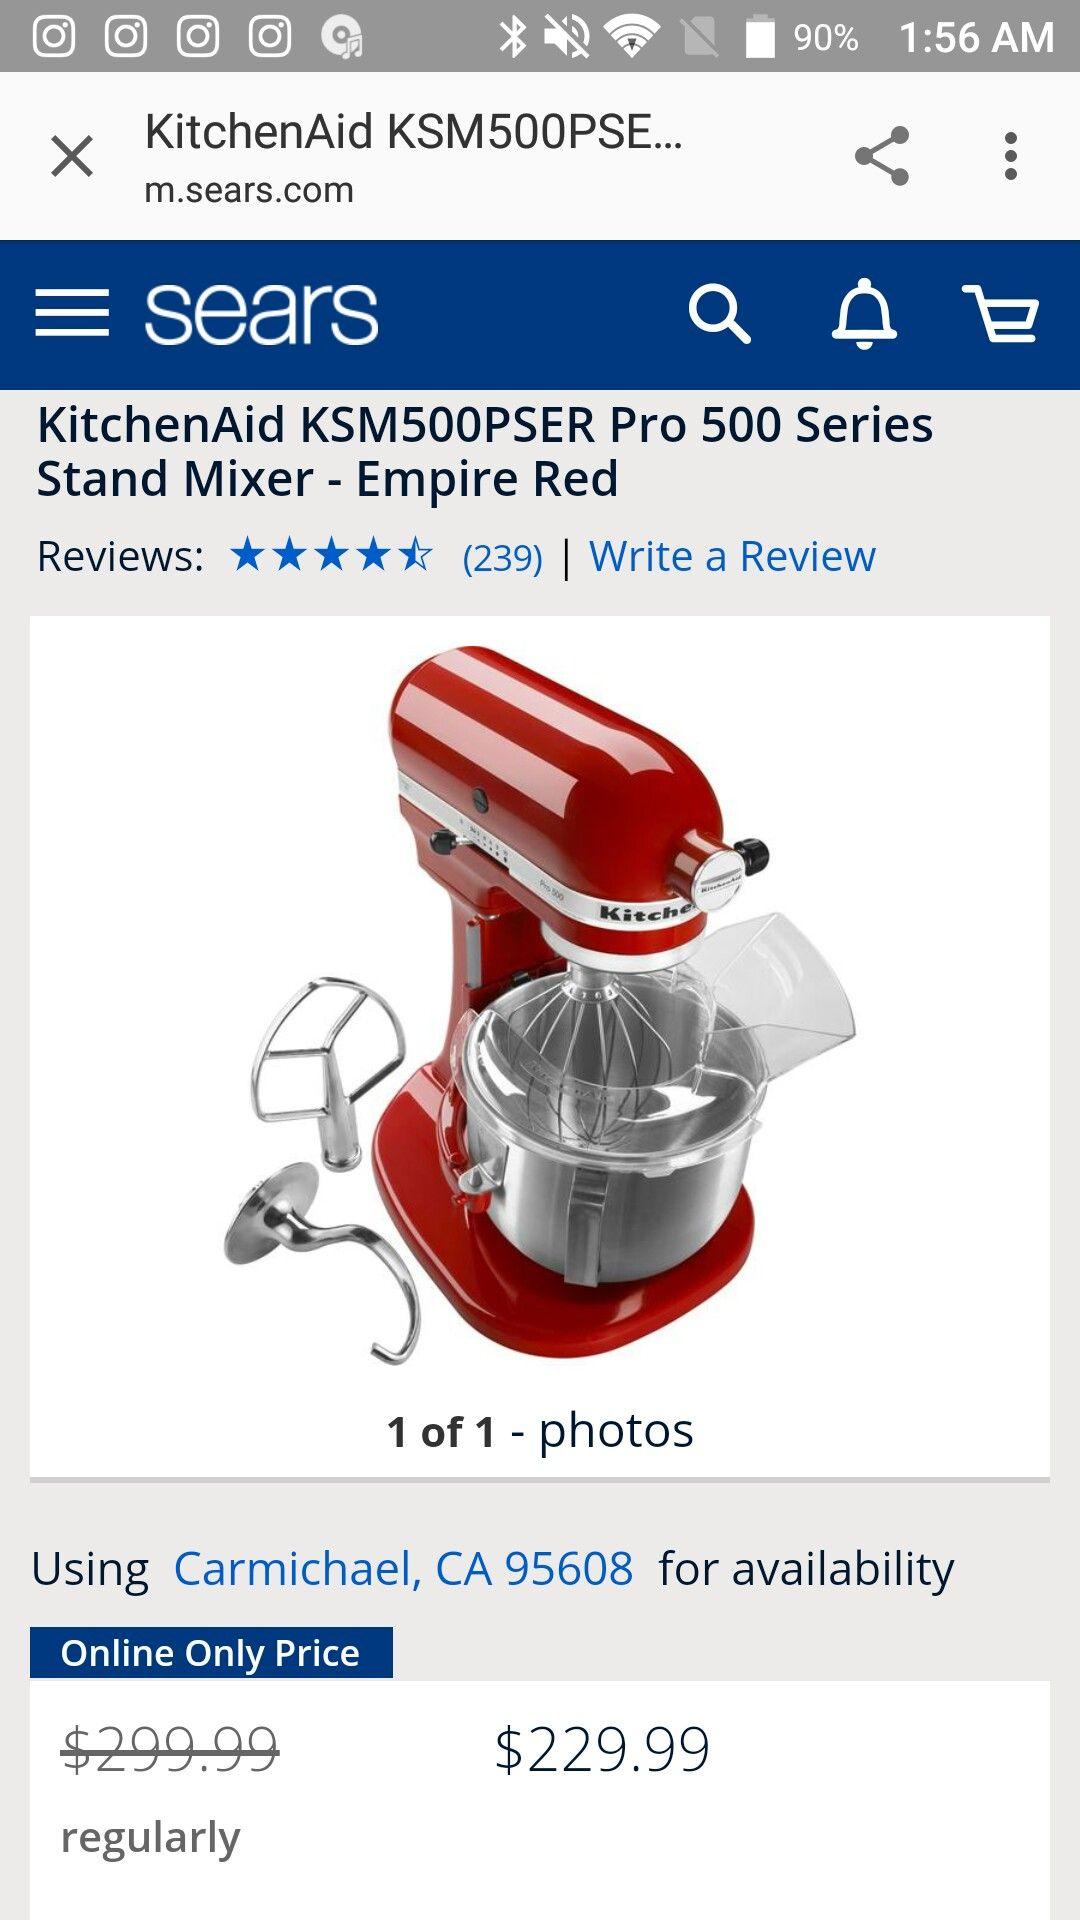 kitchenaid mixer empire red uk